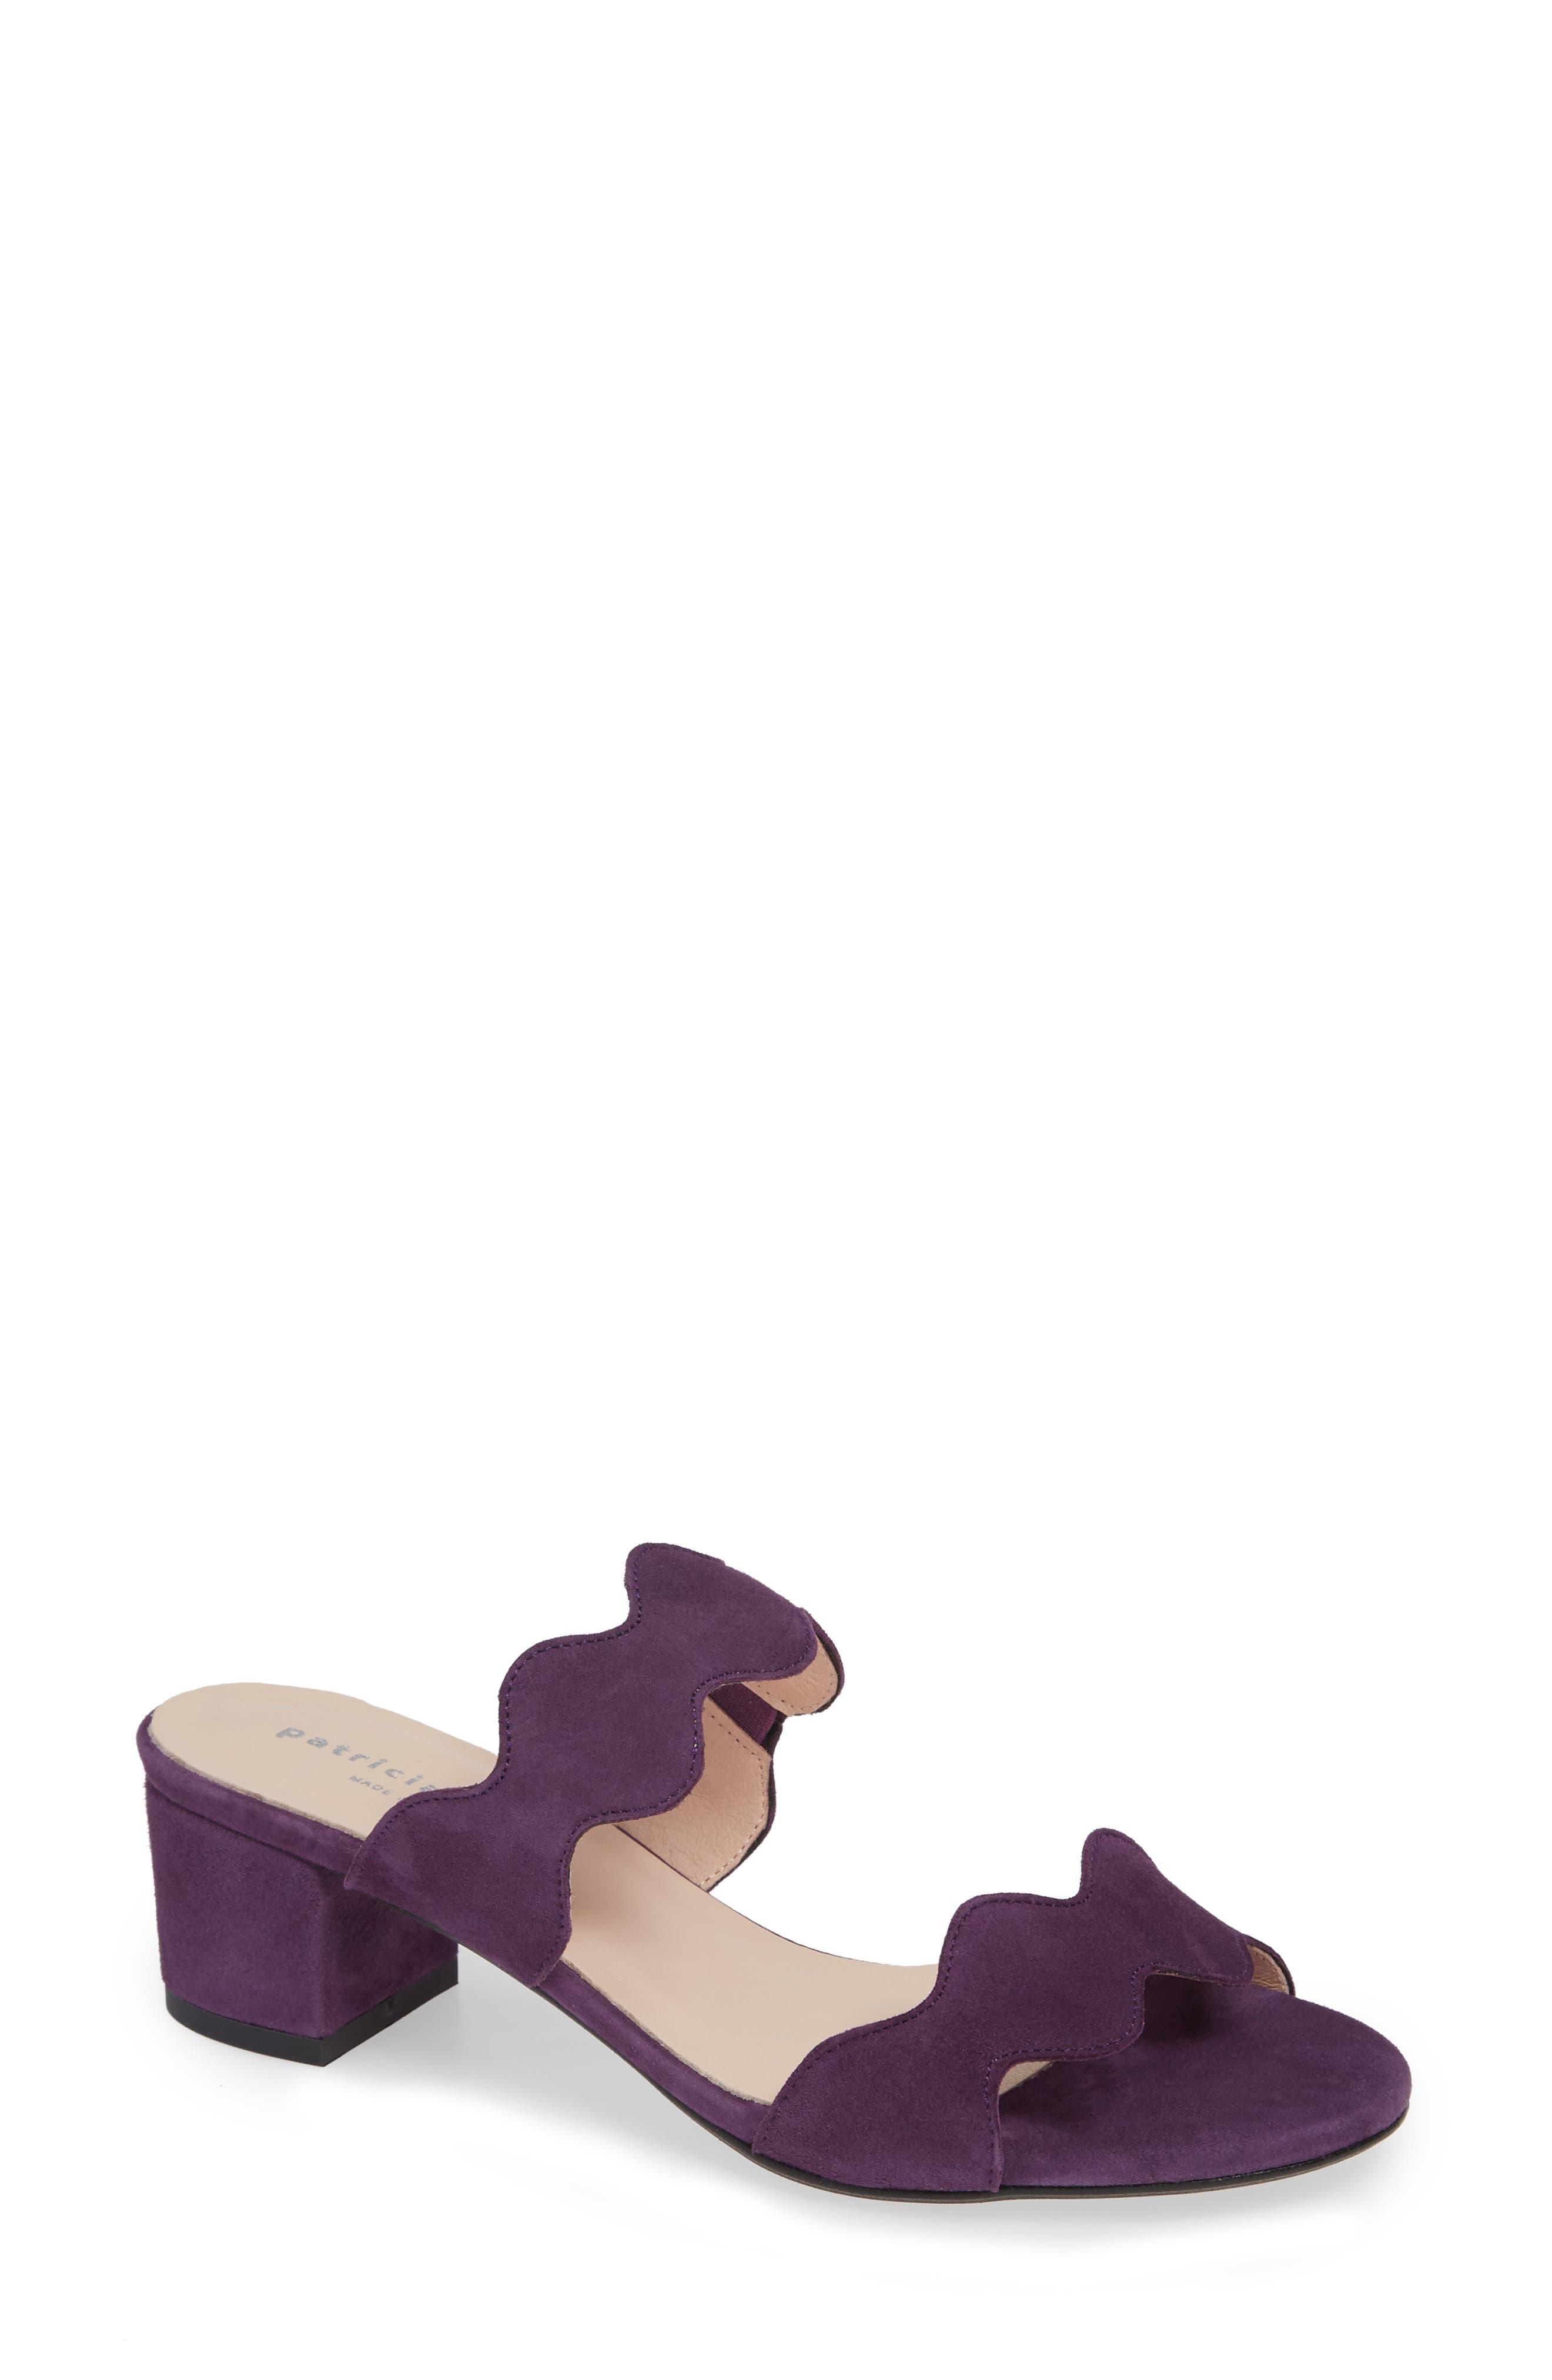 Patricia Green Palm Beach Slide Sandal, Purple